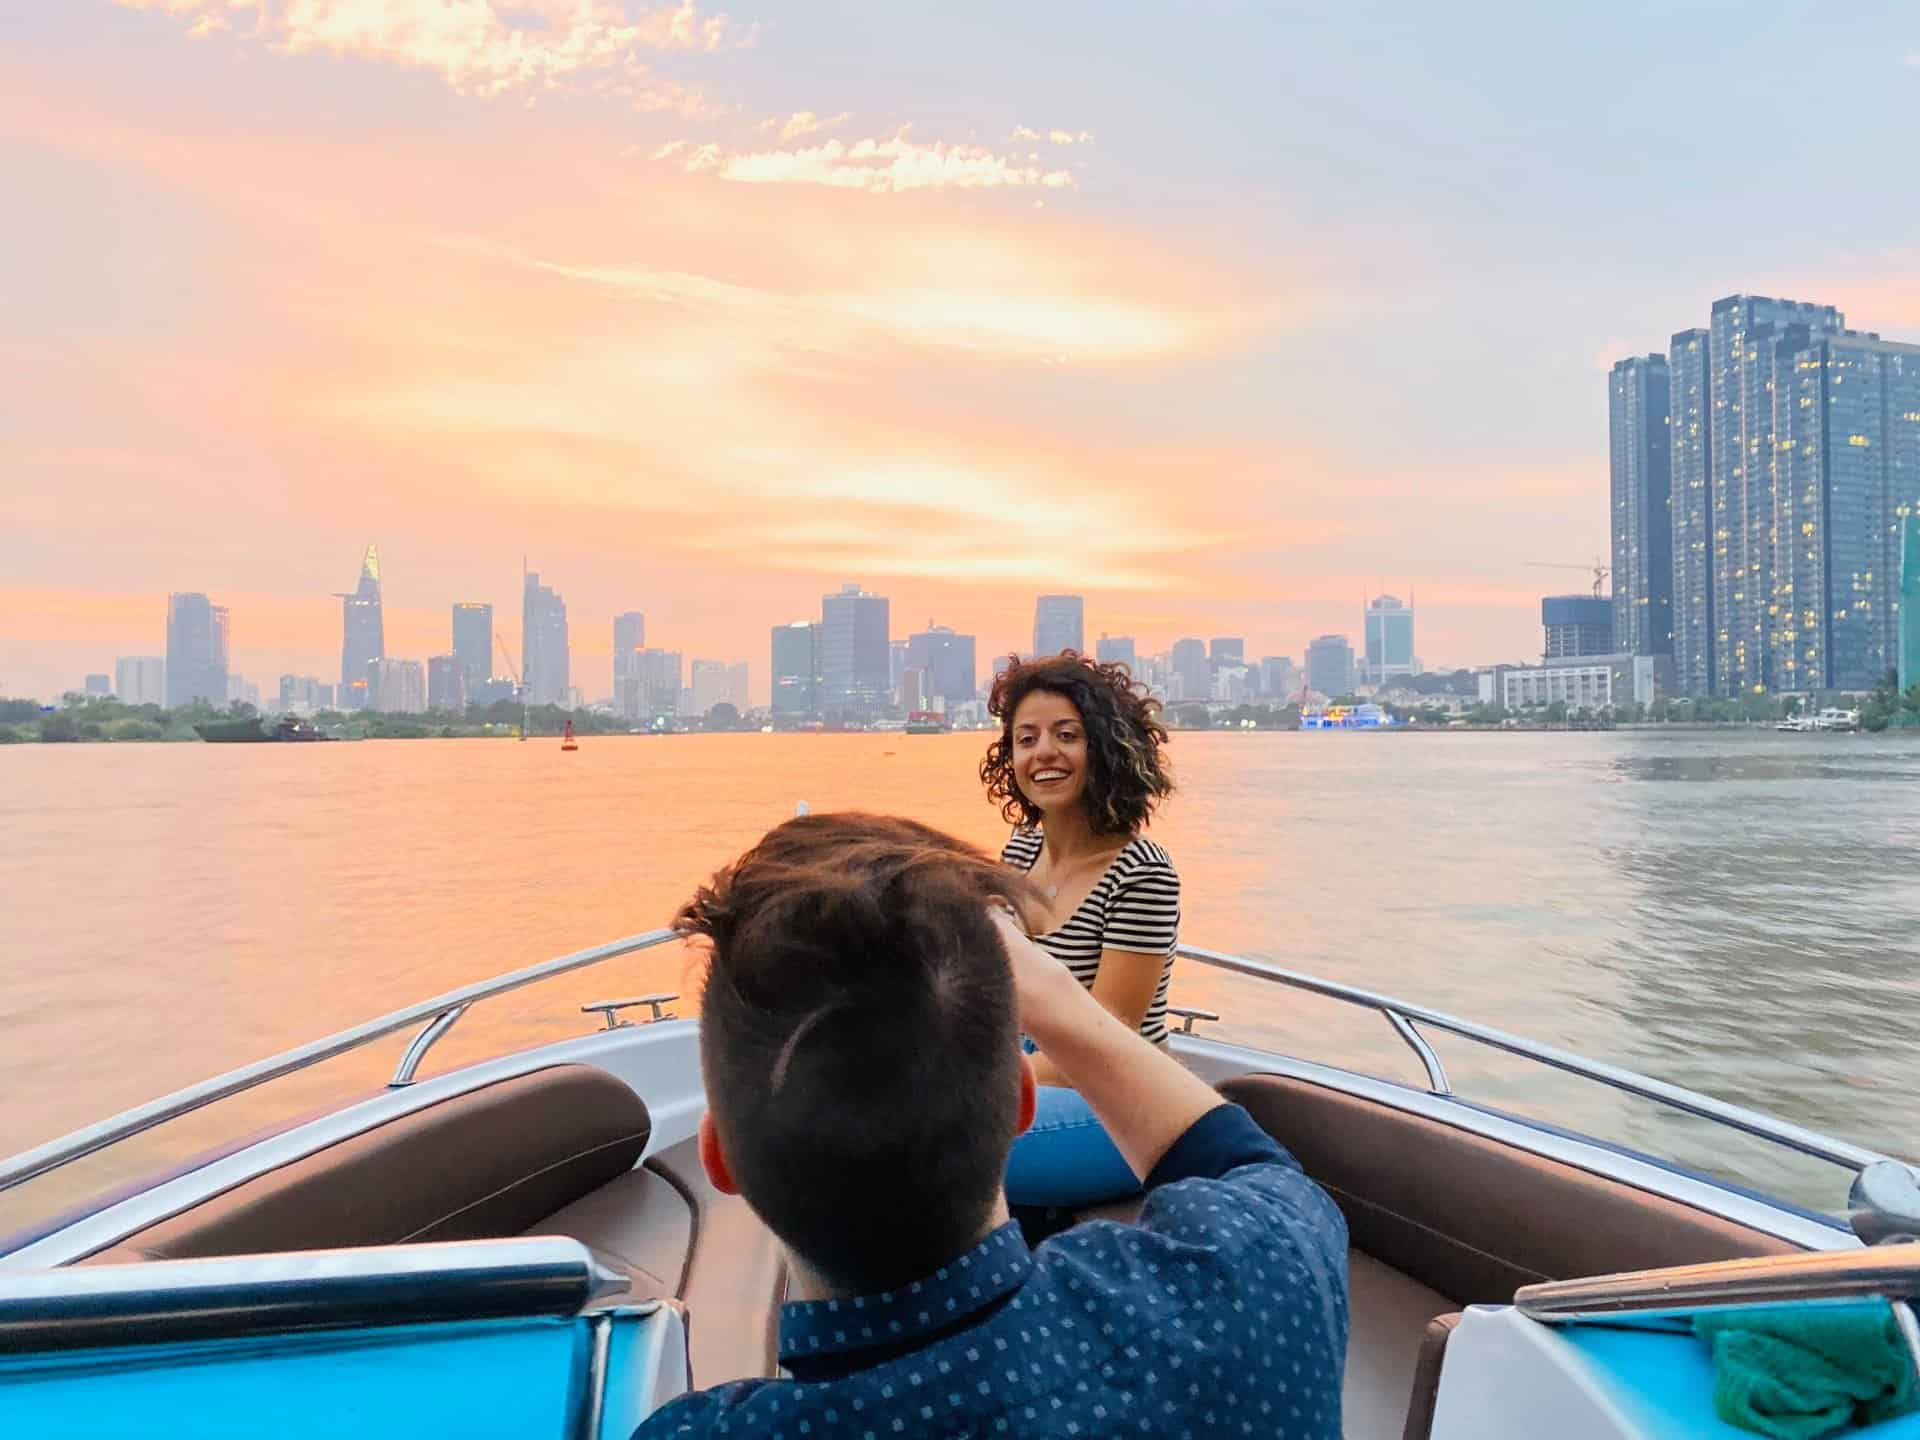 Sunset City Tour on Saigon River by Speedboat